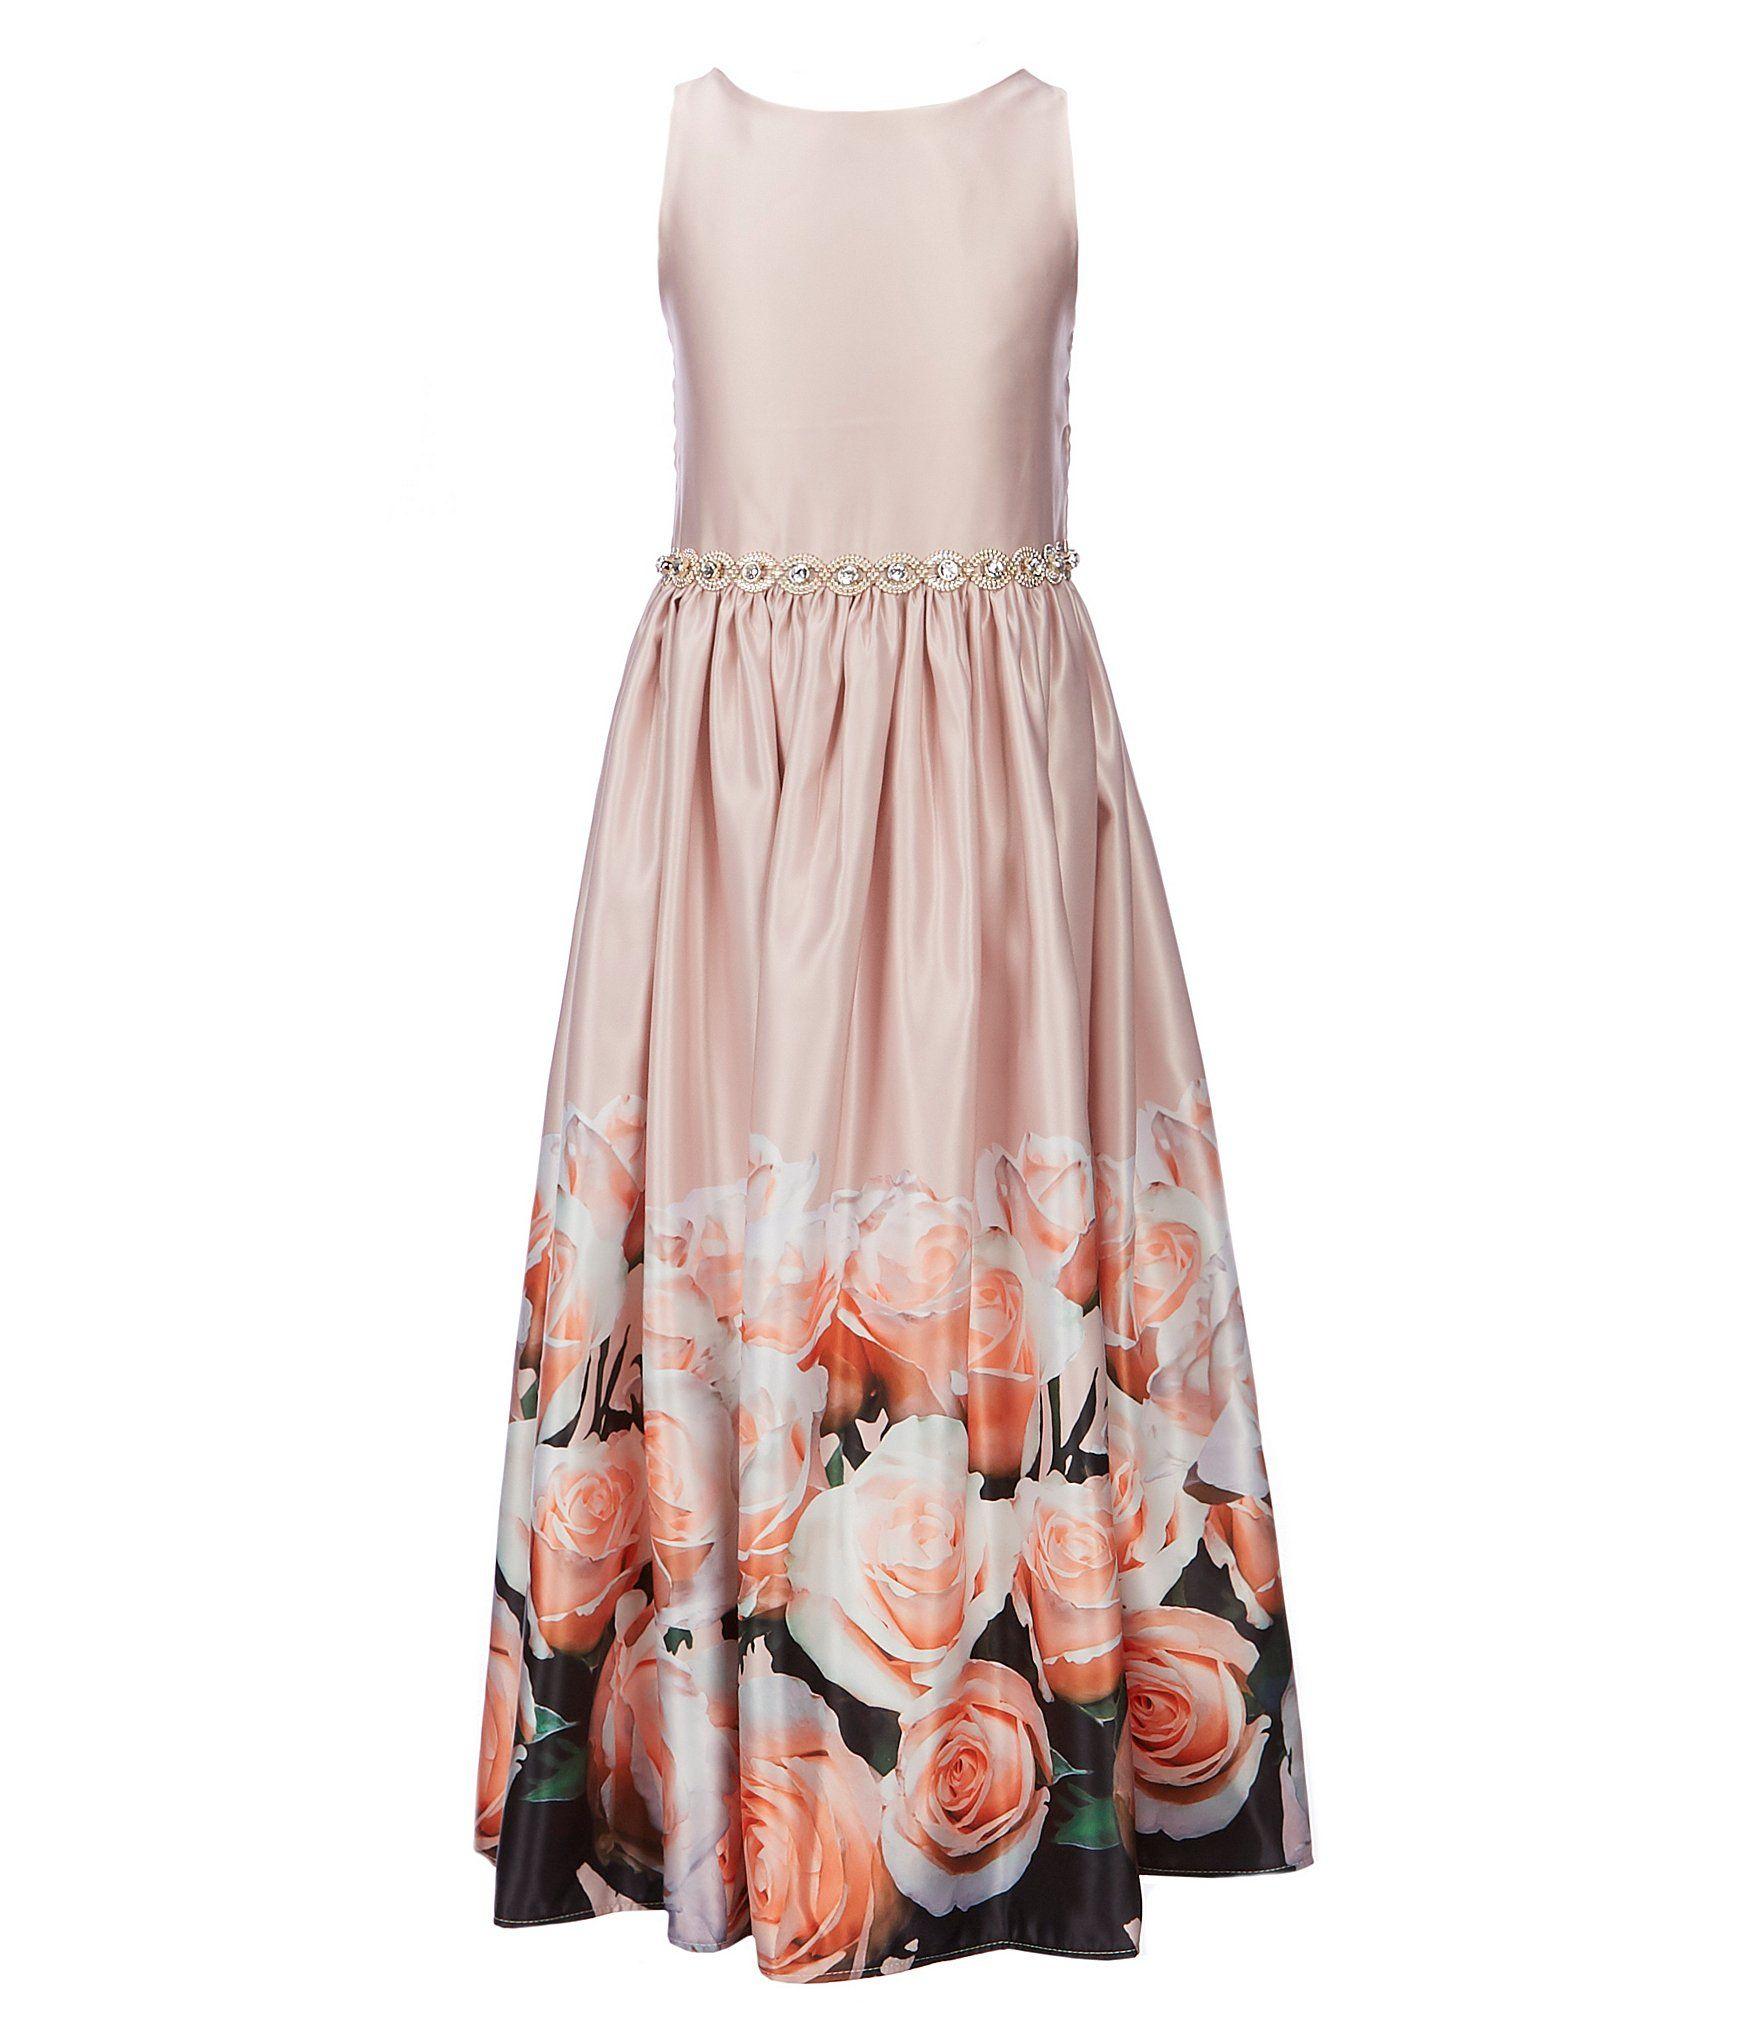 3c526bd1eee Belle Badgley Mischka Big Girls 7-16 Solid Floral-Border Belted Maxi Dress   Dillards